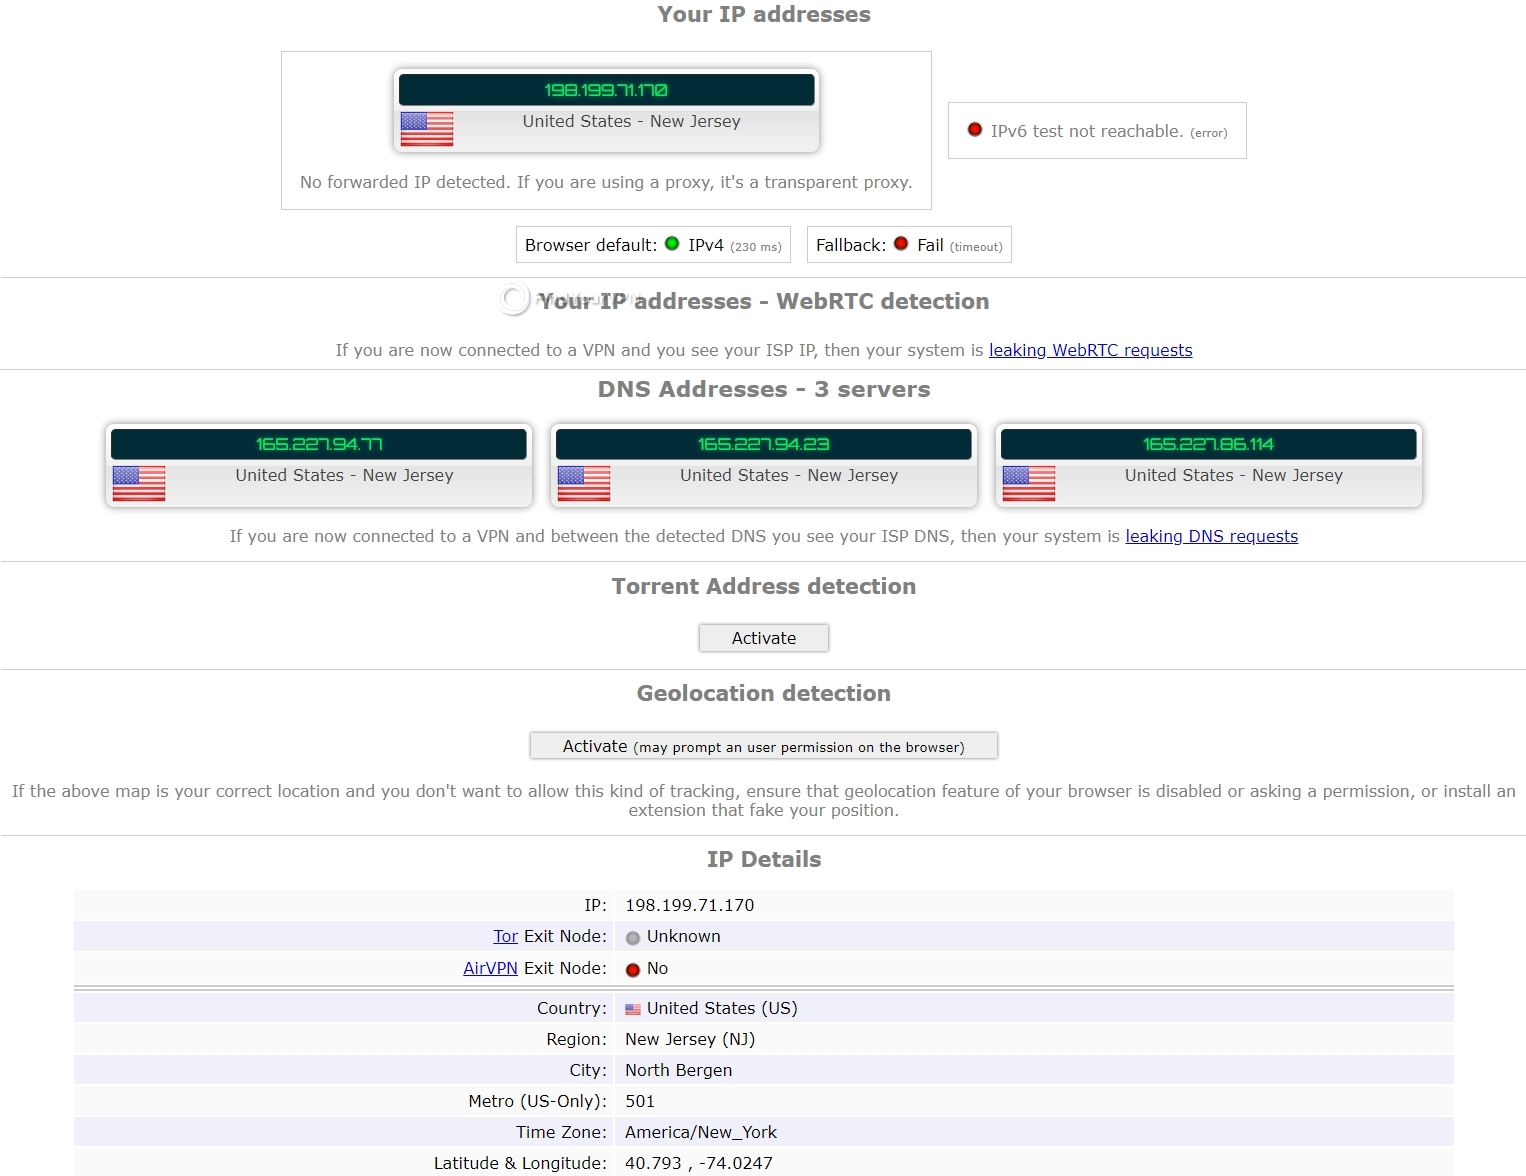 The Hola VPN ipleak results